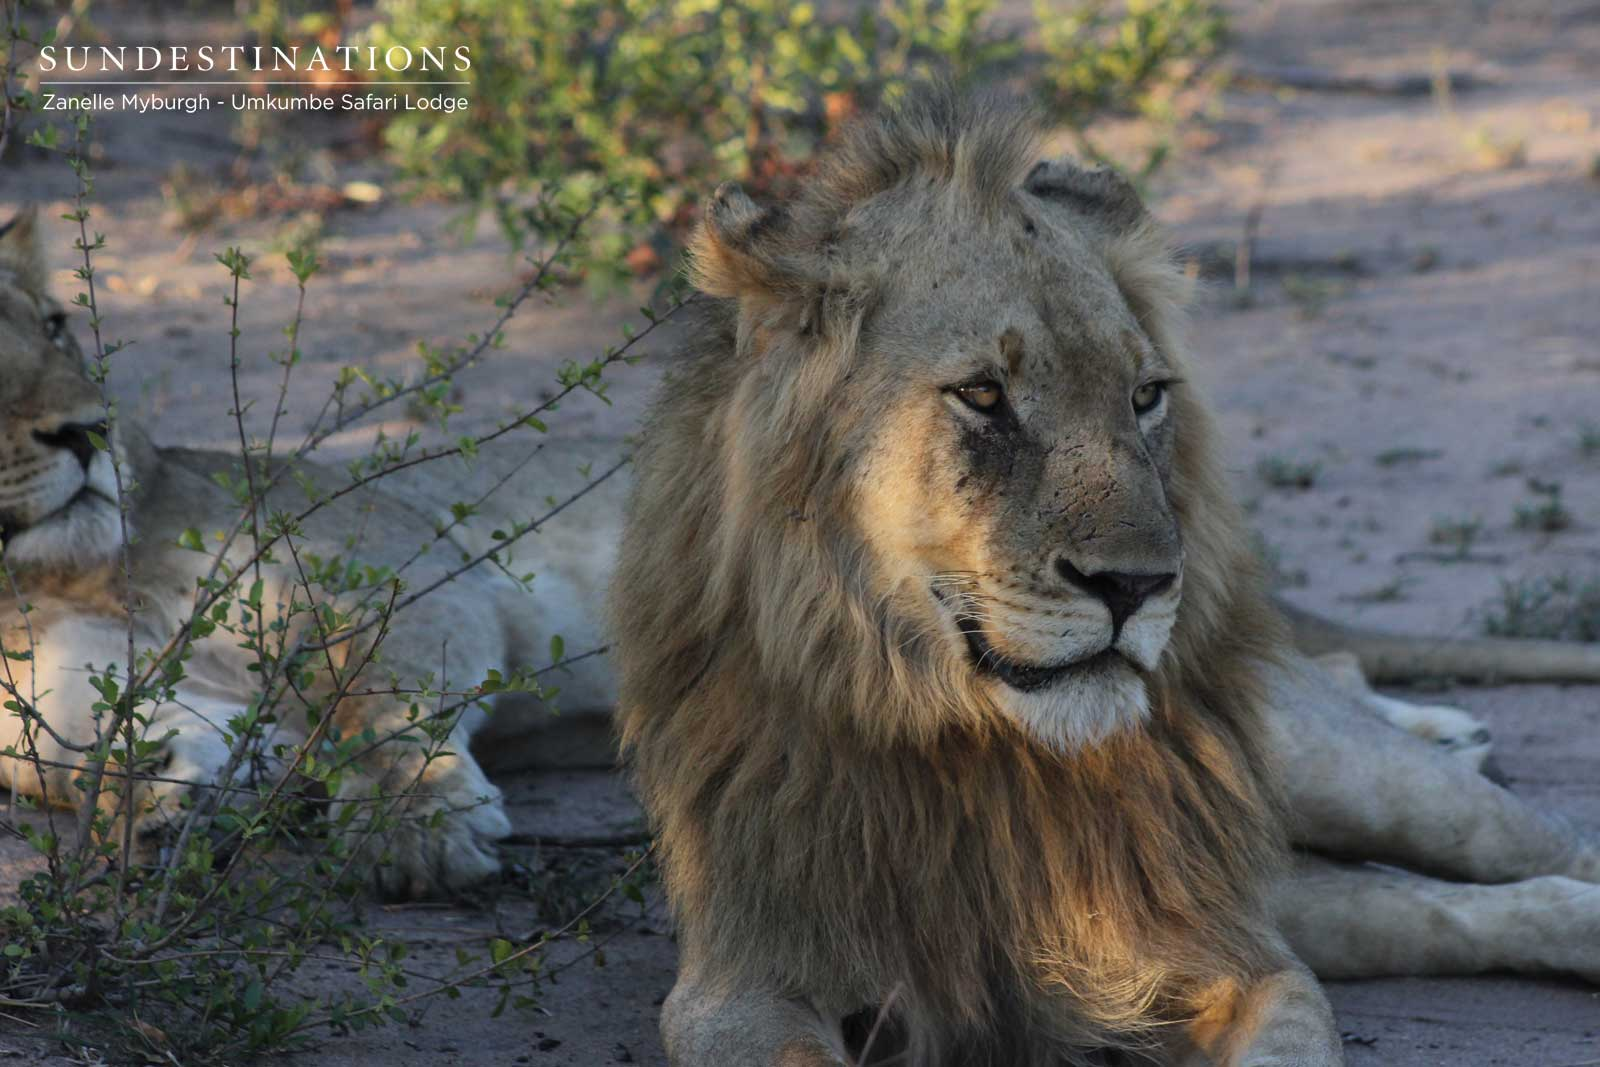 Avoca Lions Male